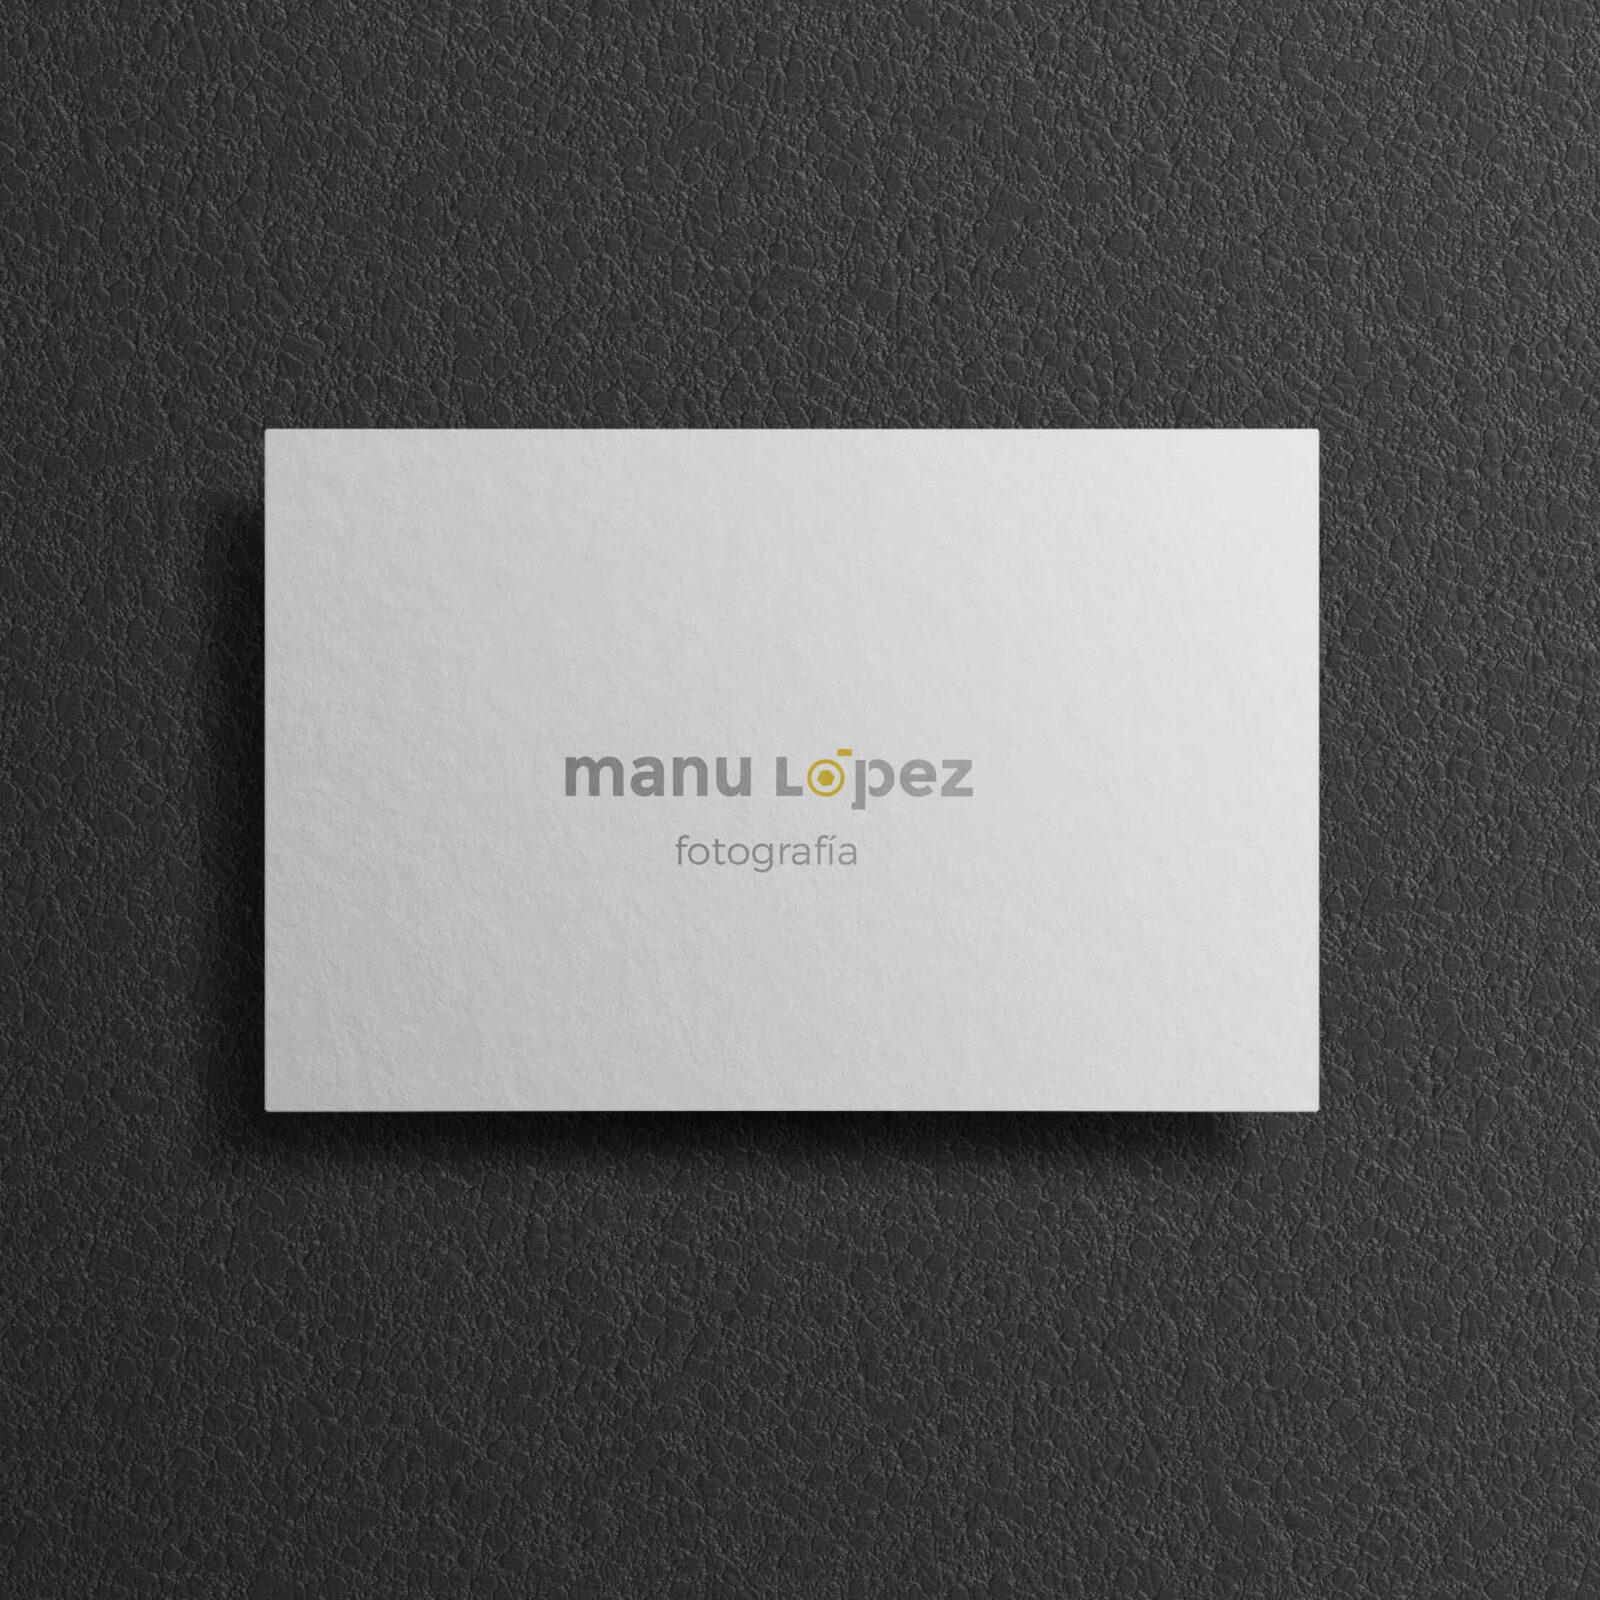 logotipo-para-fotografo-opcion 2